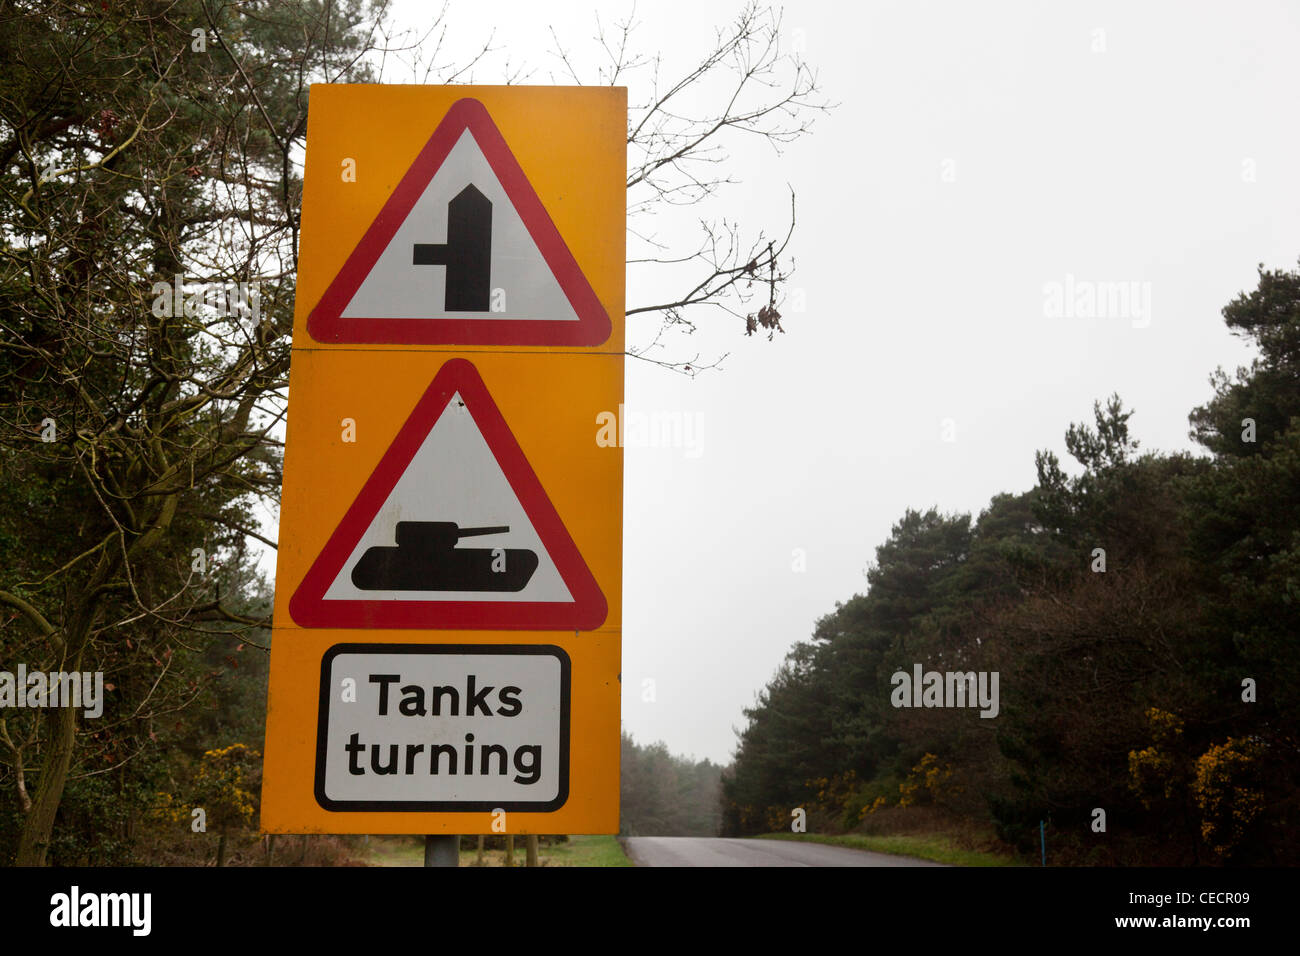 Road sign warning of tanks turning, Bovington Camp, Dorset, England. - Stock Image